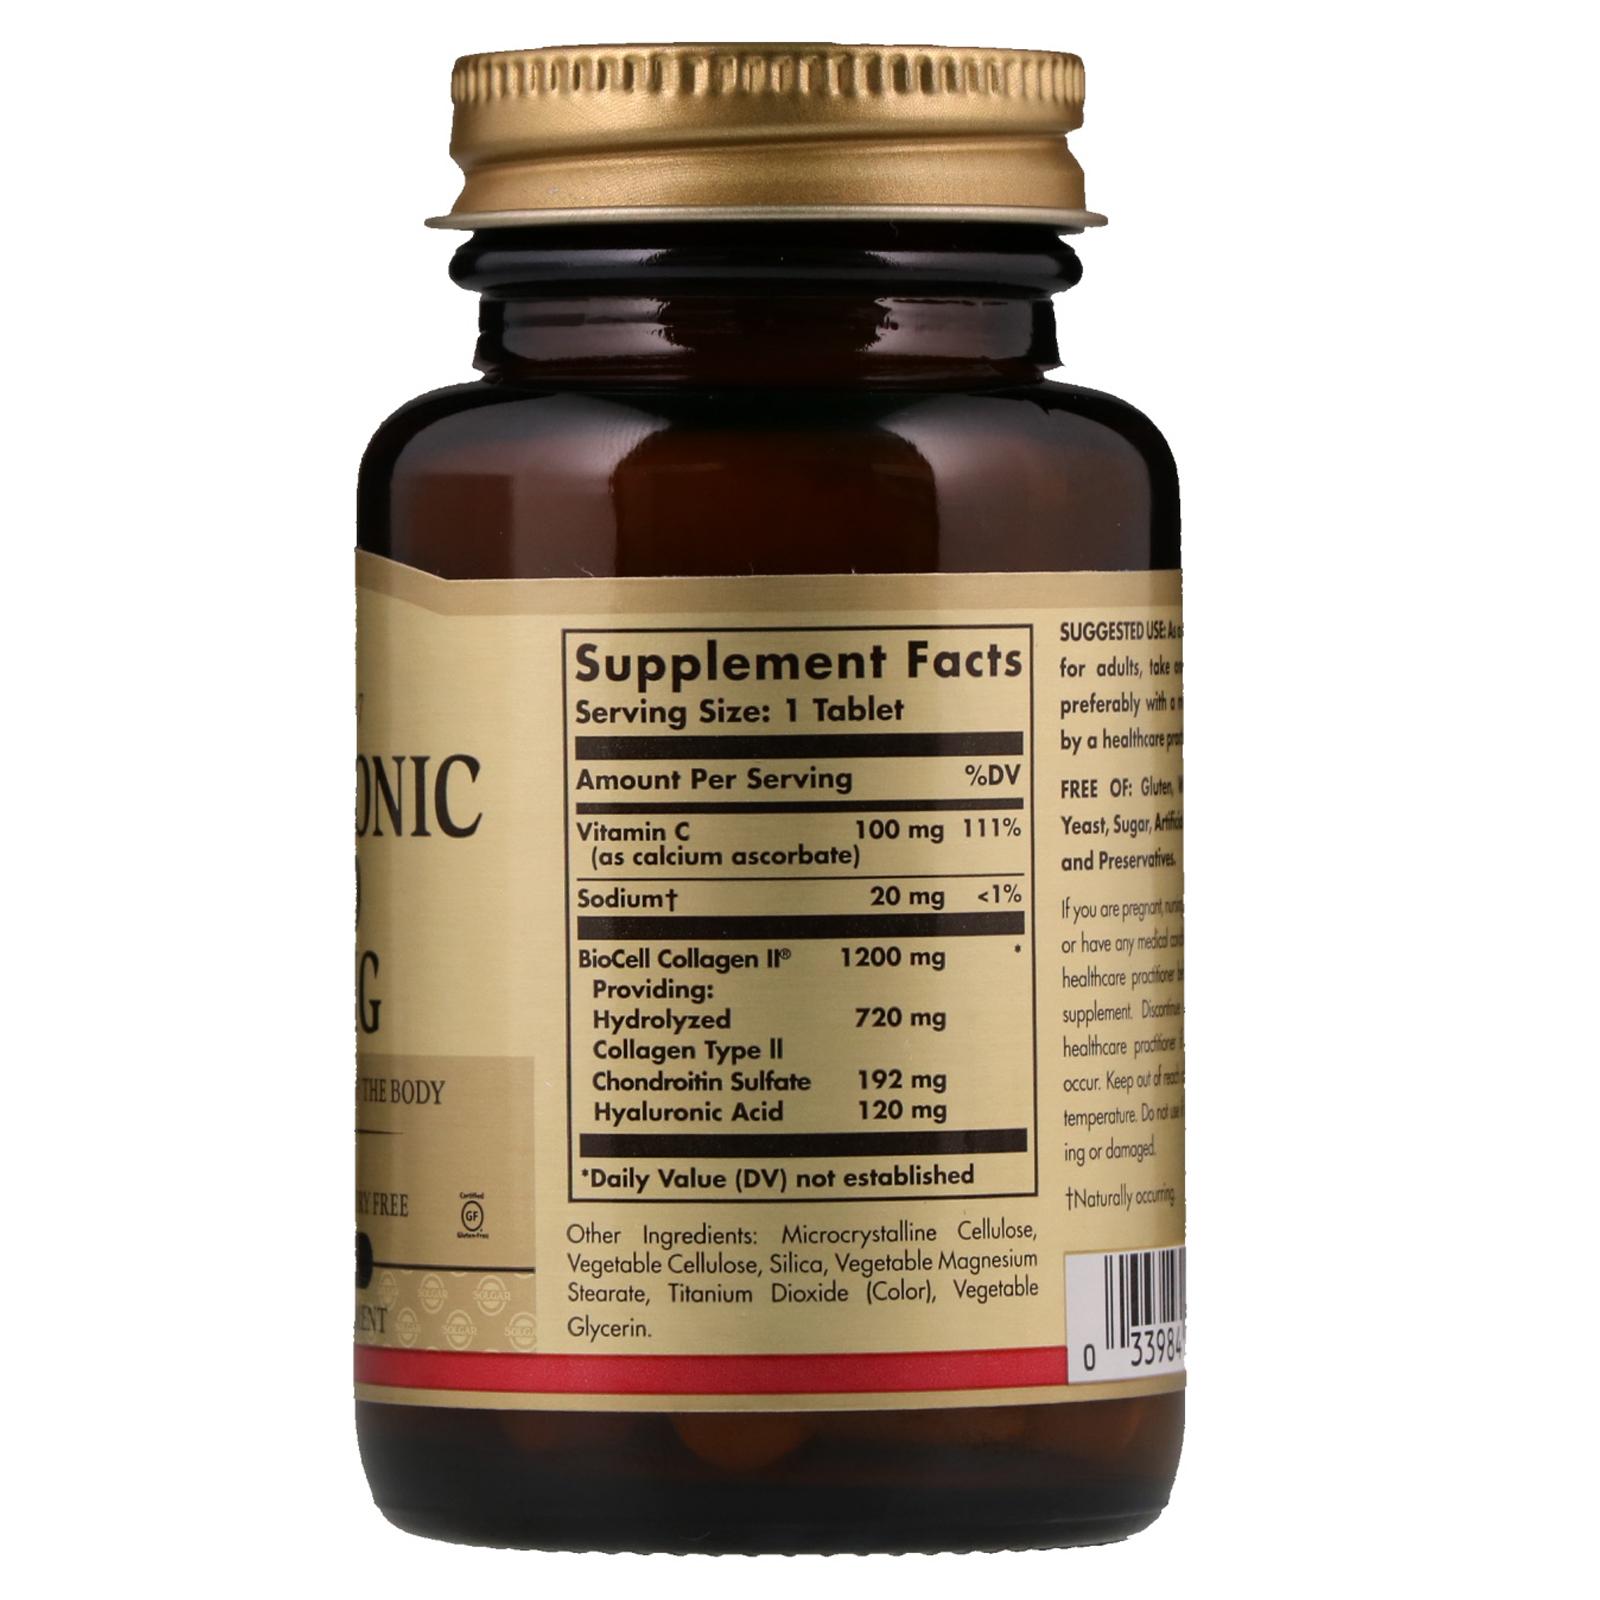 Solgar, Hyaluronic Acid, 120 mg, 30 Tablets - iHerb.com